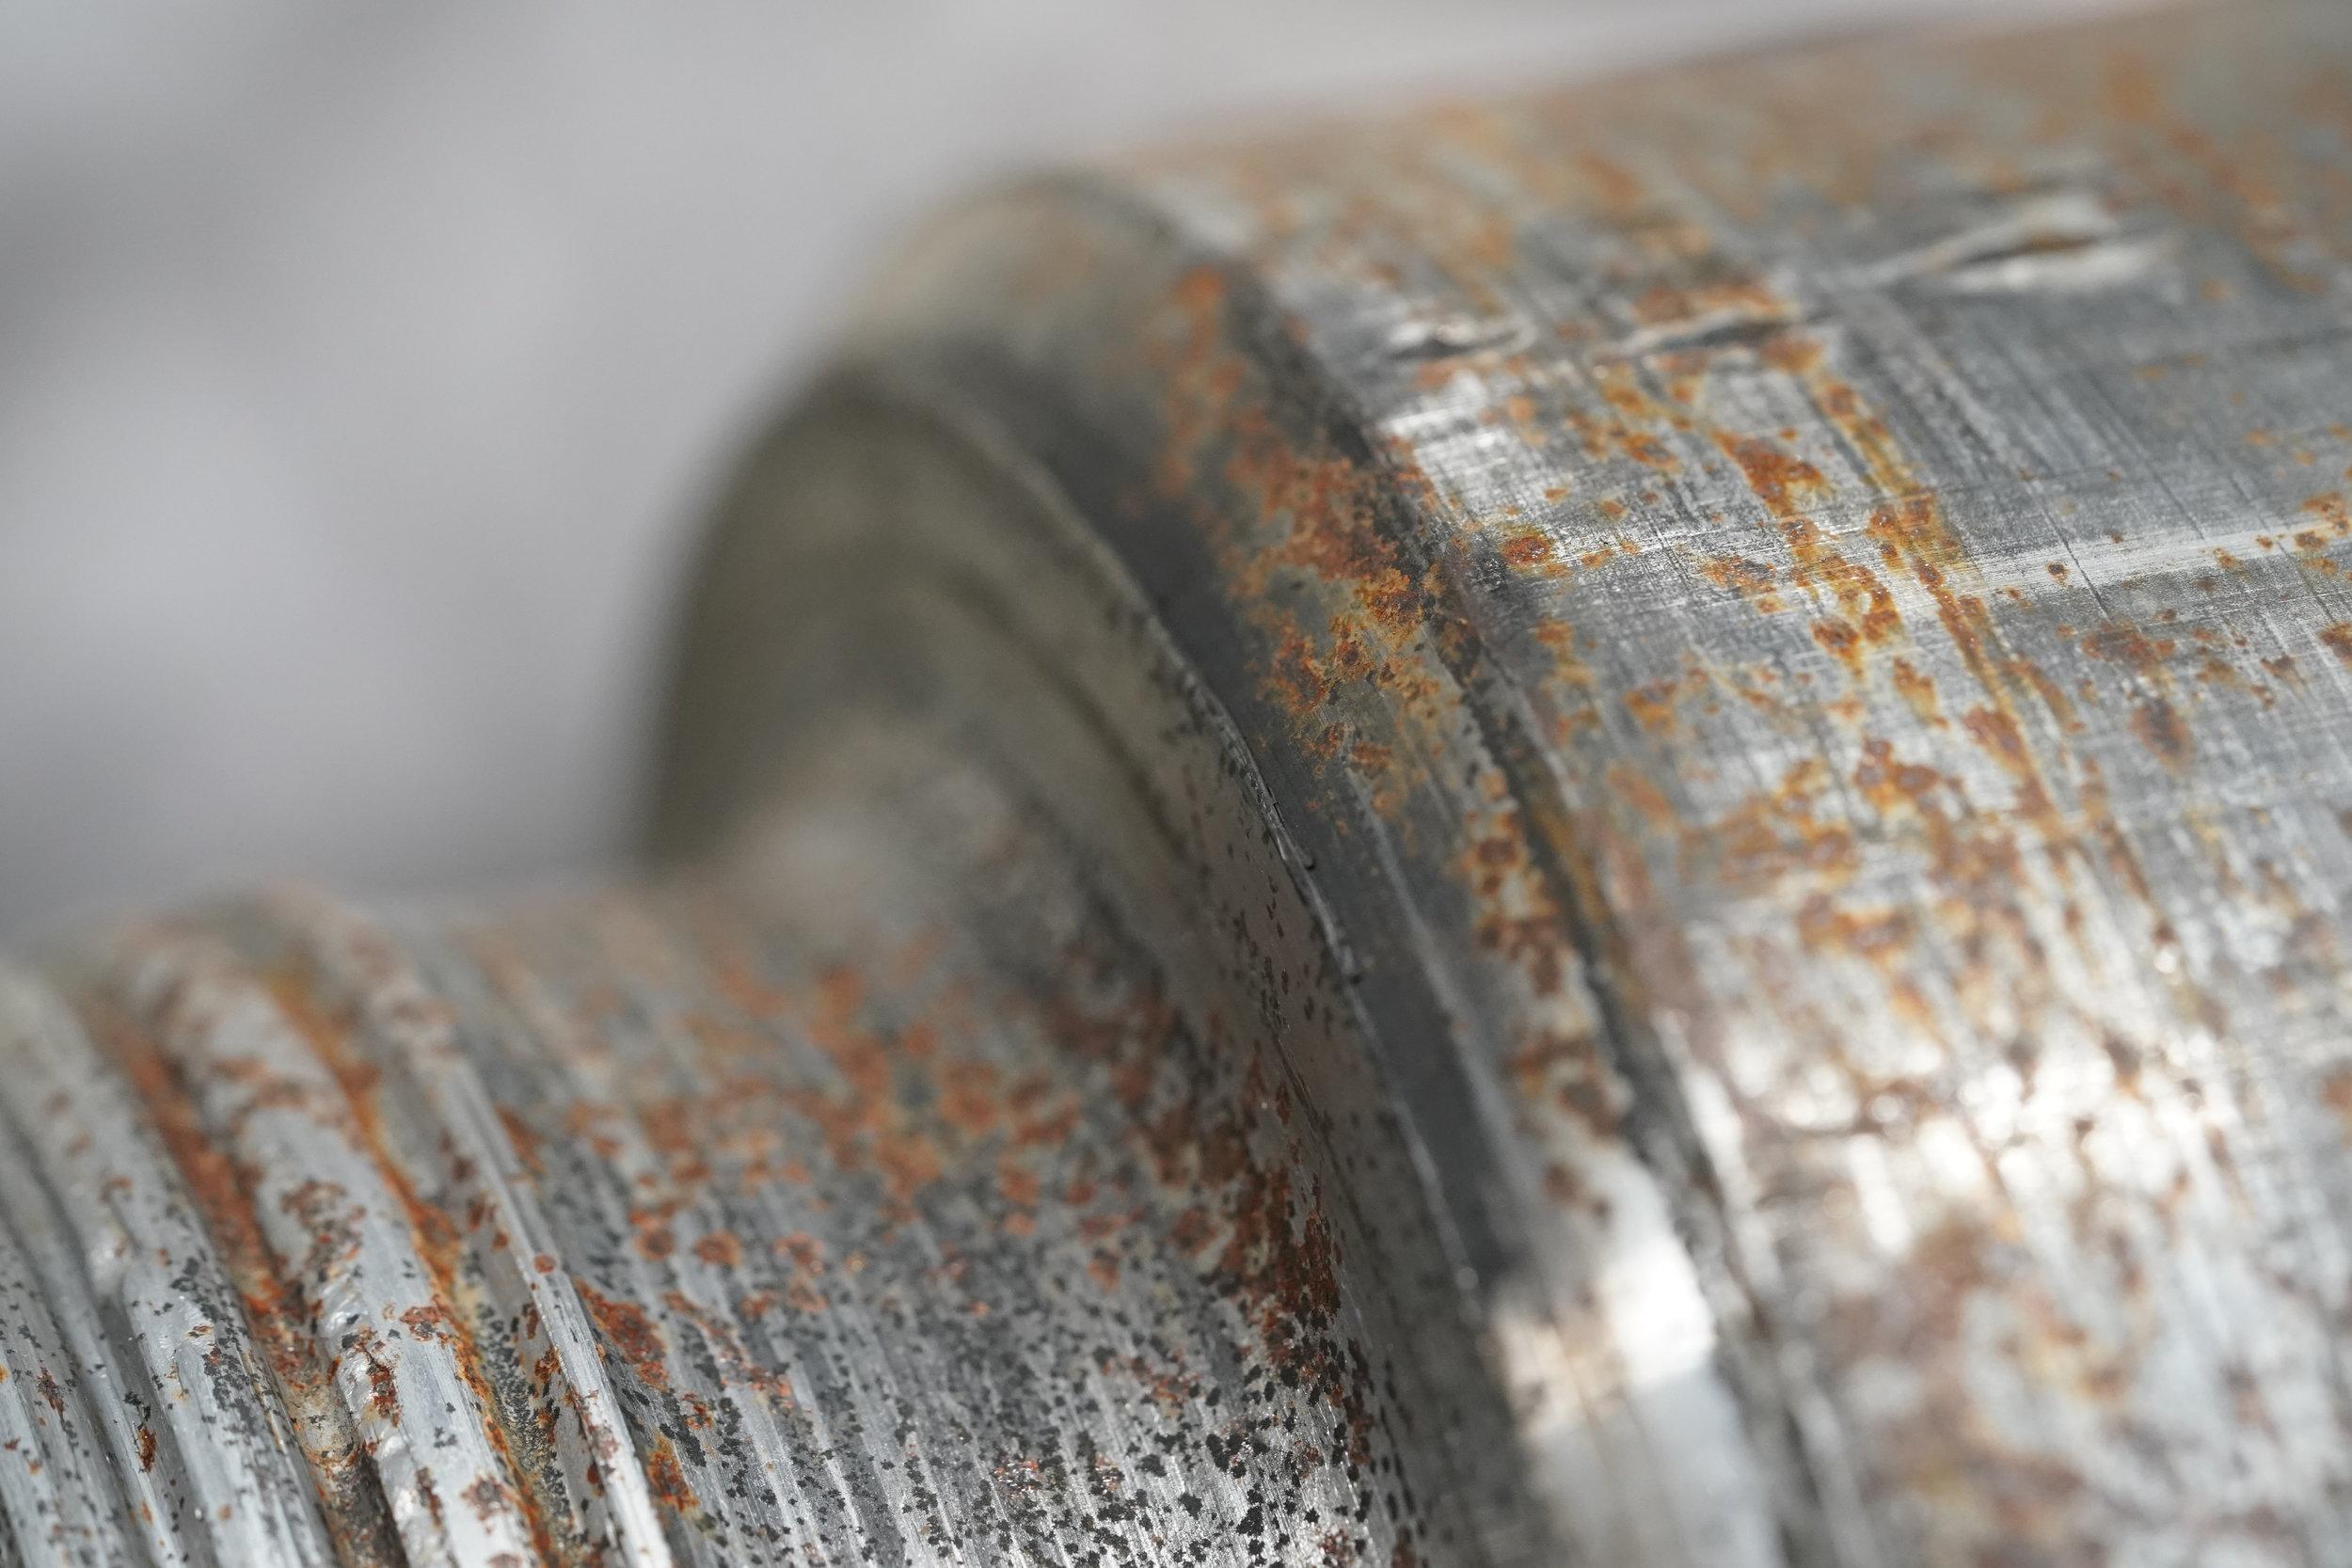 Drilling Engineering - Drill String Engineering